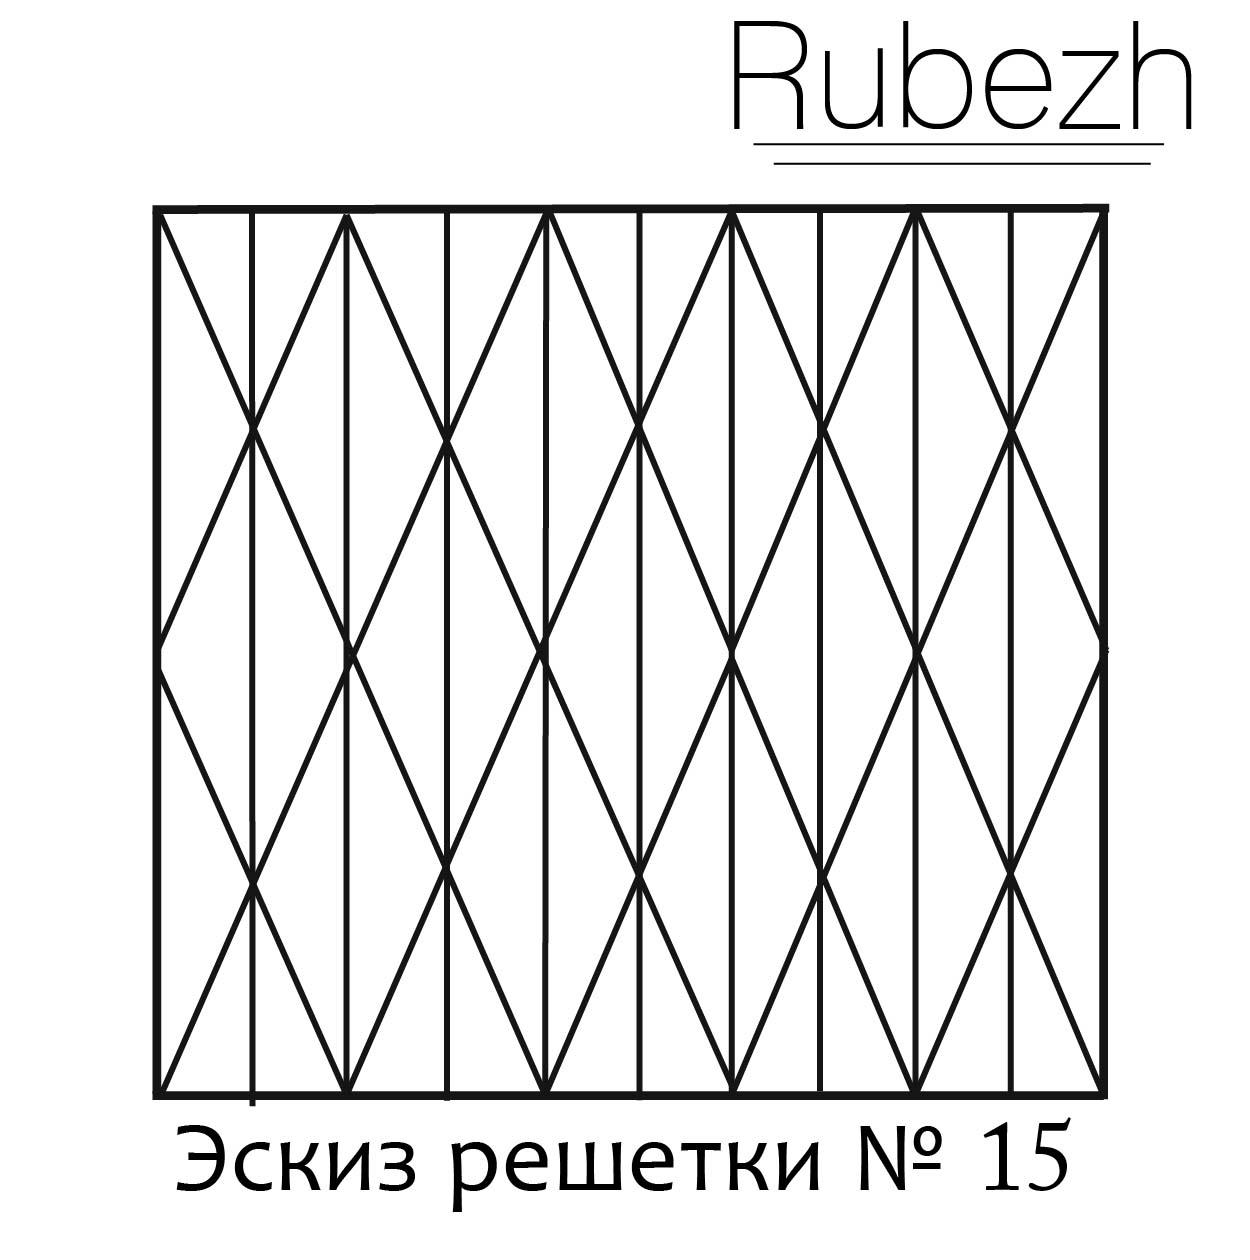 Эскиз решетки № 15